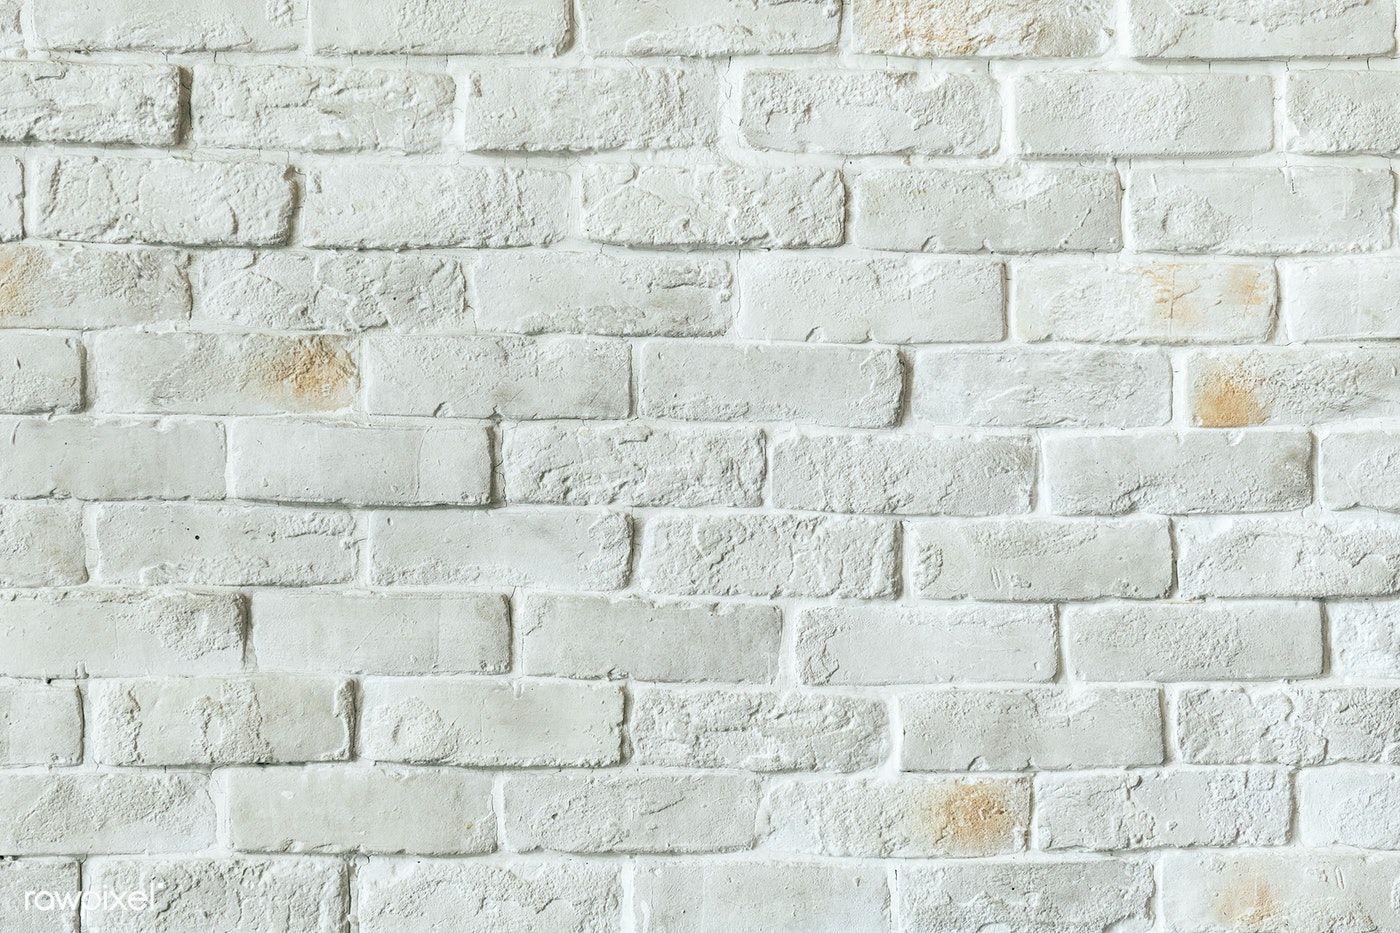 White Brick Wall Textured Background Free Image By Rawpixel Com Brick Wall Background Textured Walls White Brick Walls